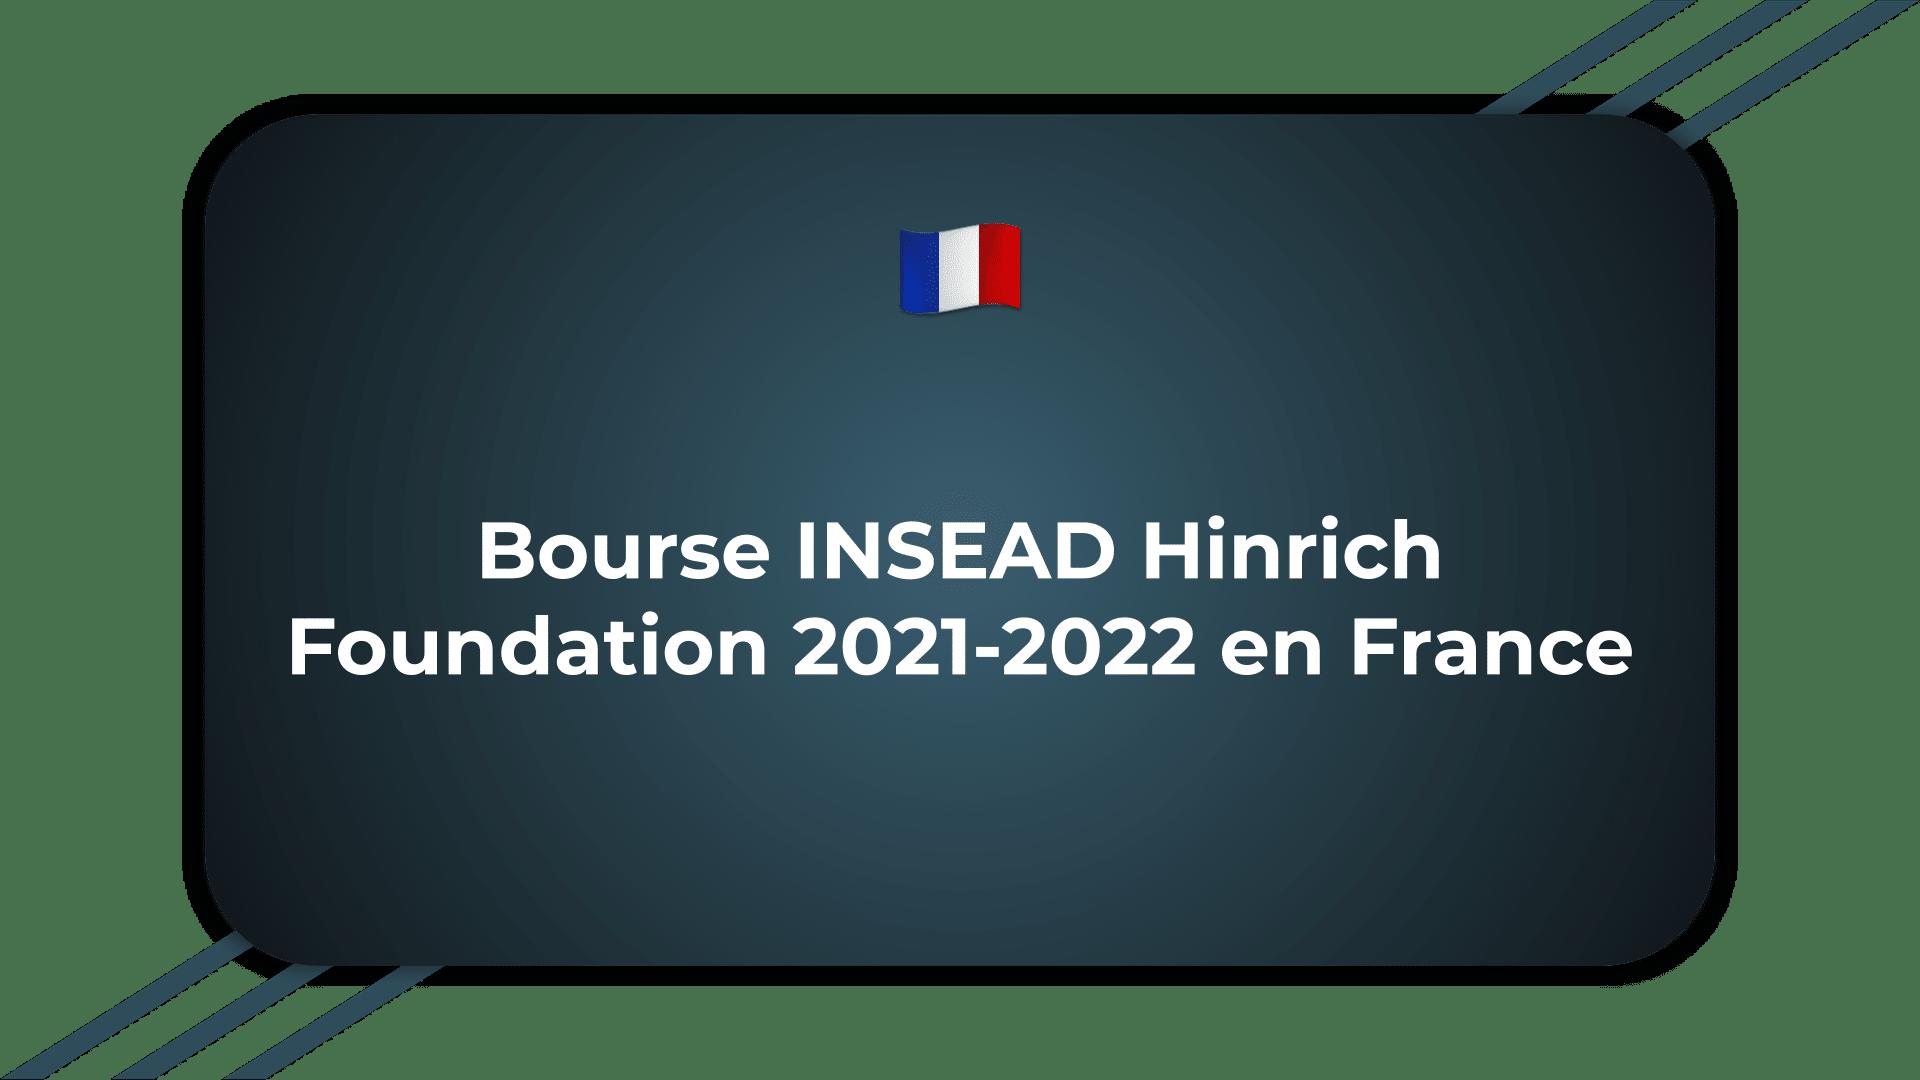 Bourse INSEAD Hinrich Foundation